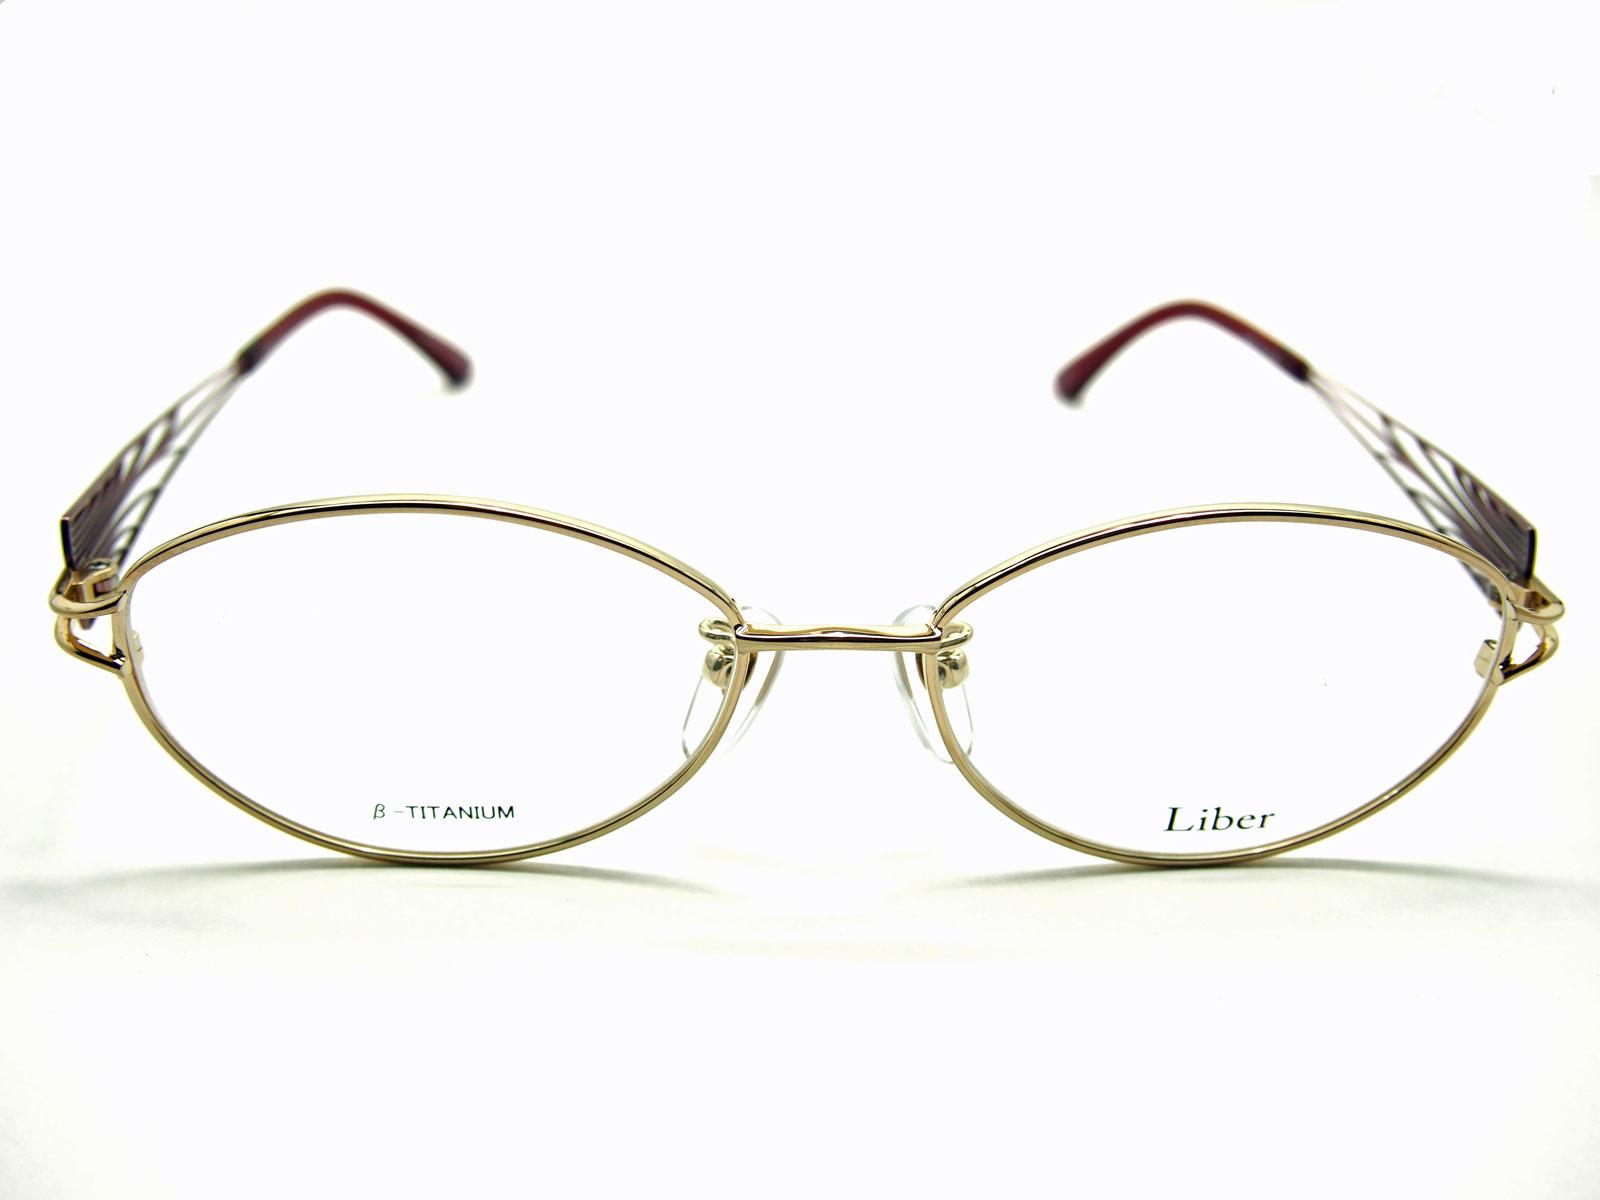 Eyeglass Frames Without Temples : eye-berry Rakuten Global Market: Made in Japan 1.60 ...